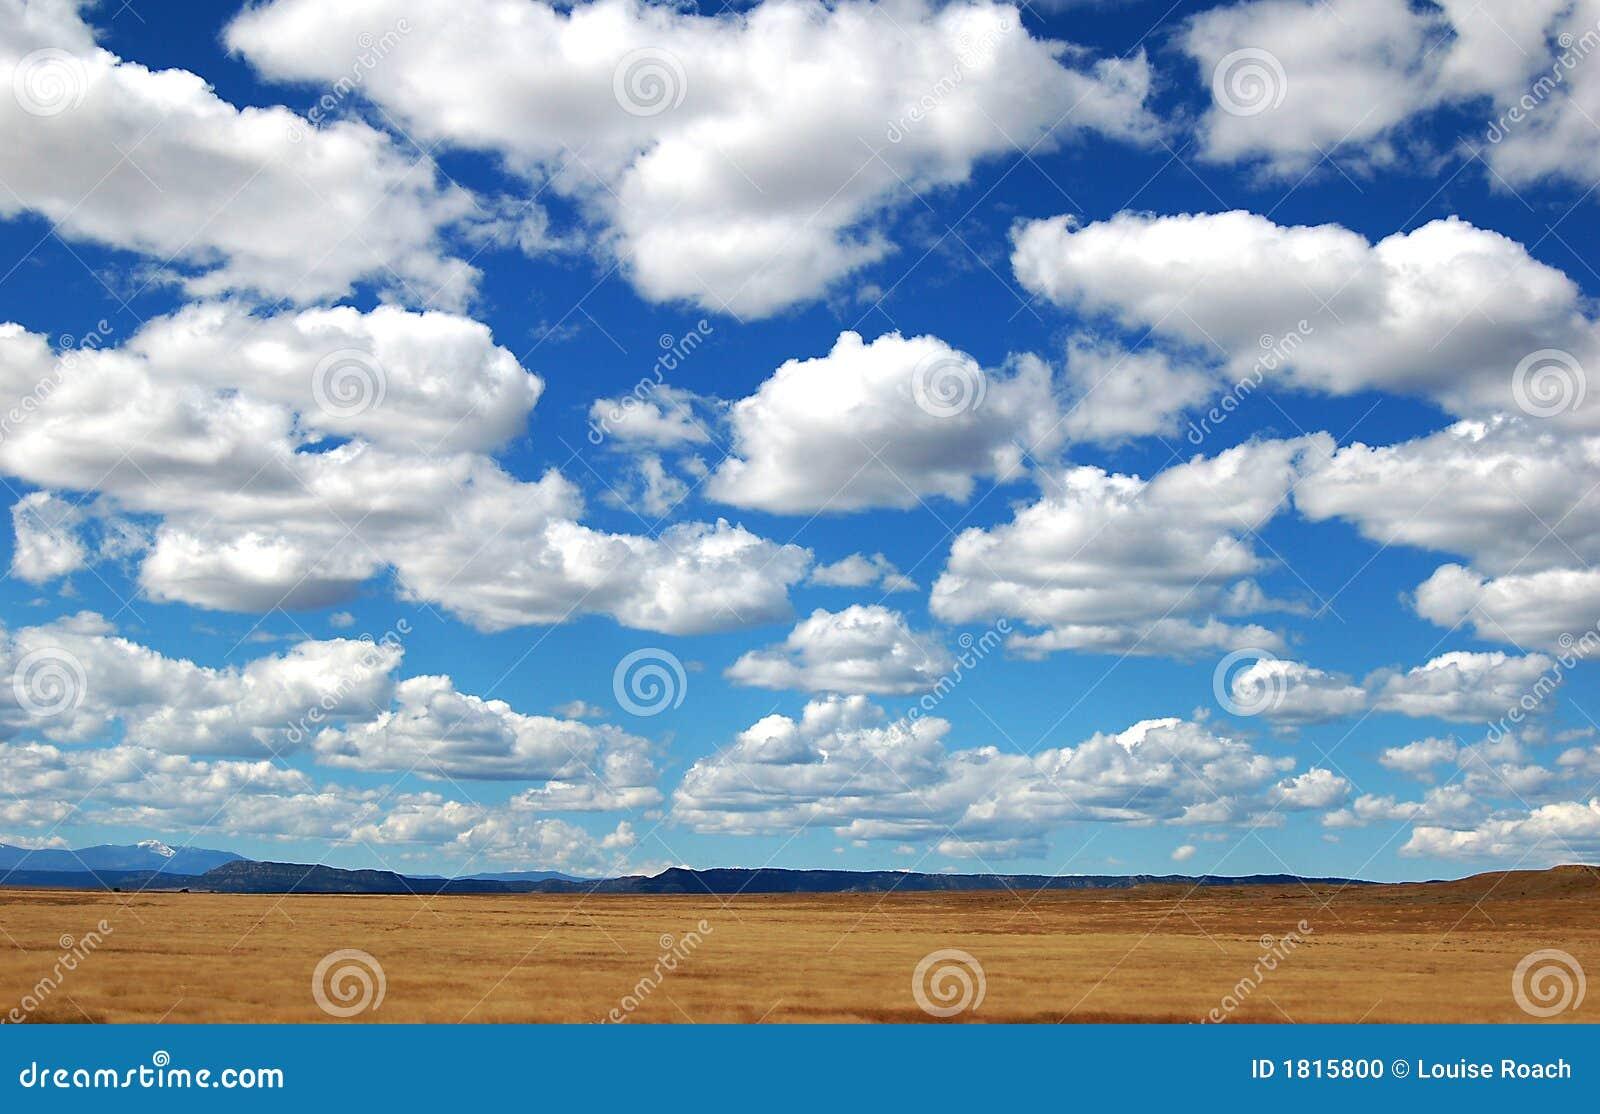 Große Himmel-Wolken